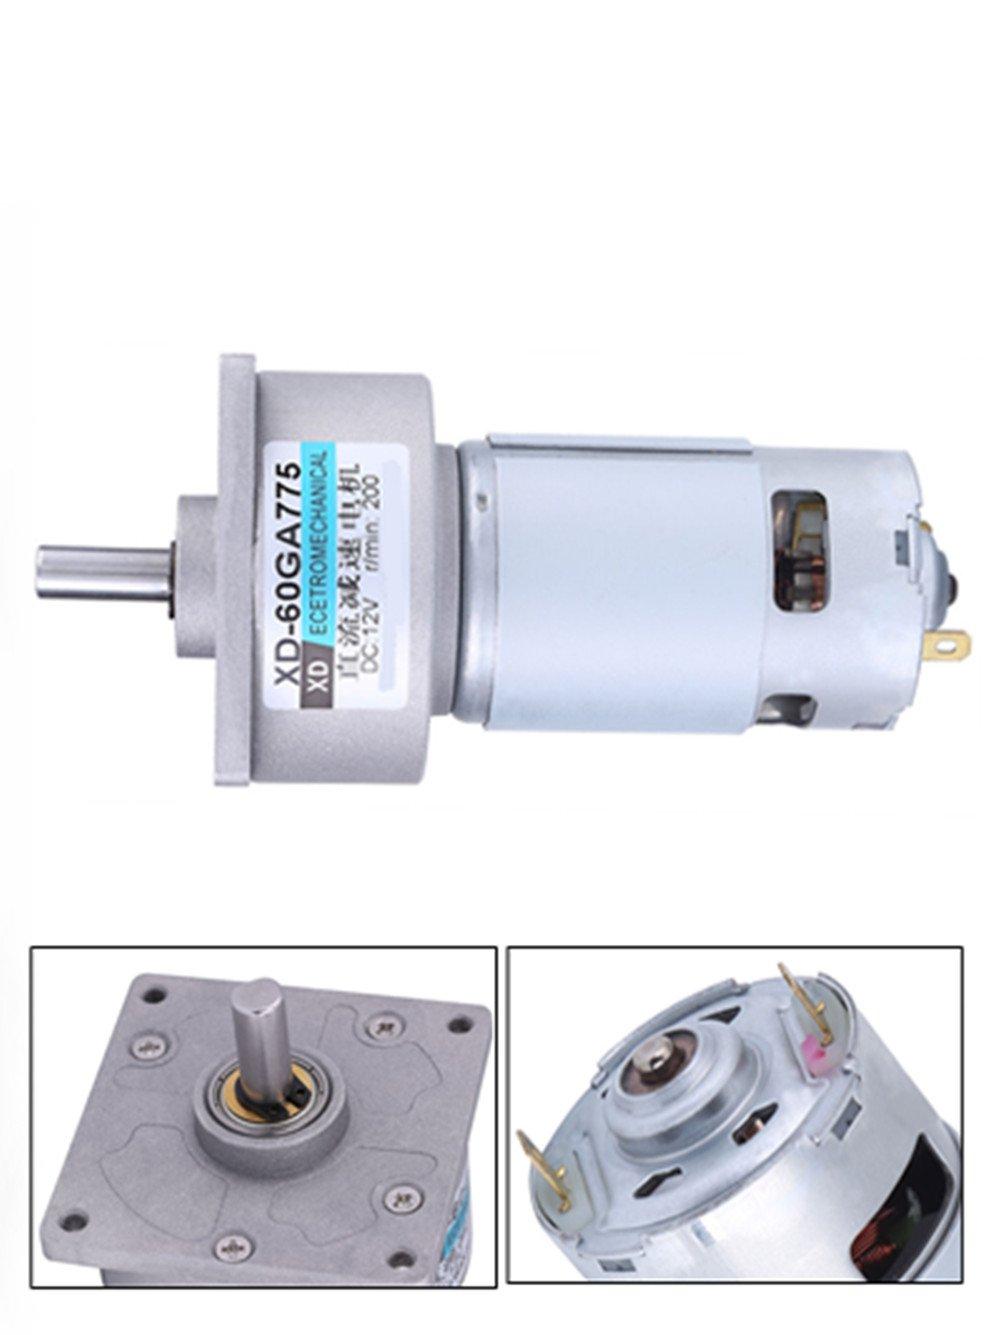 12V DC Brush Motor 35W High Torque Small Geared Motor Adjustable Speed(200 RPM )